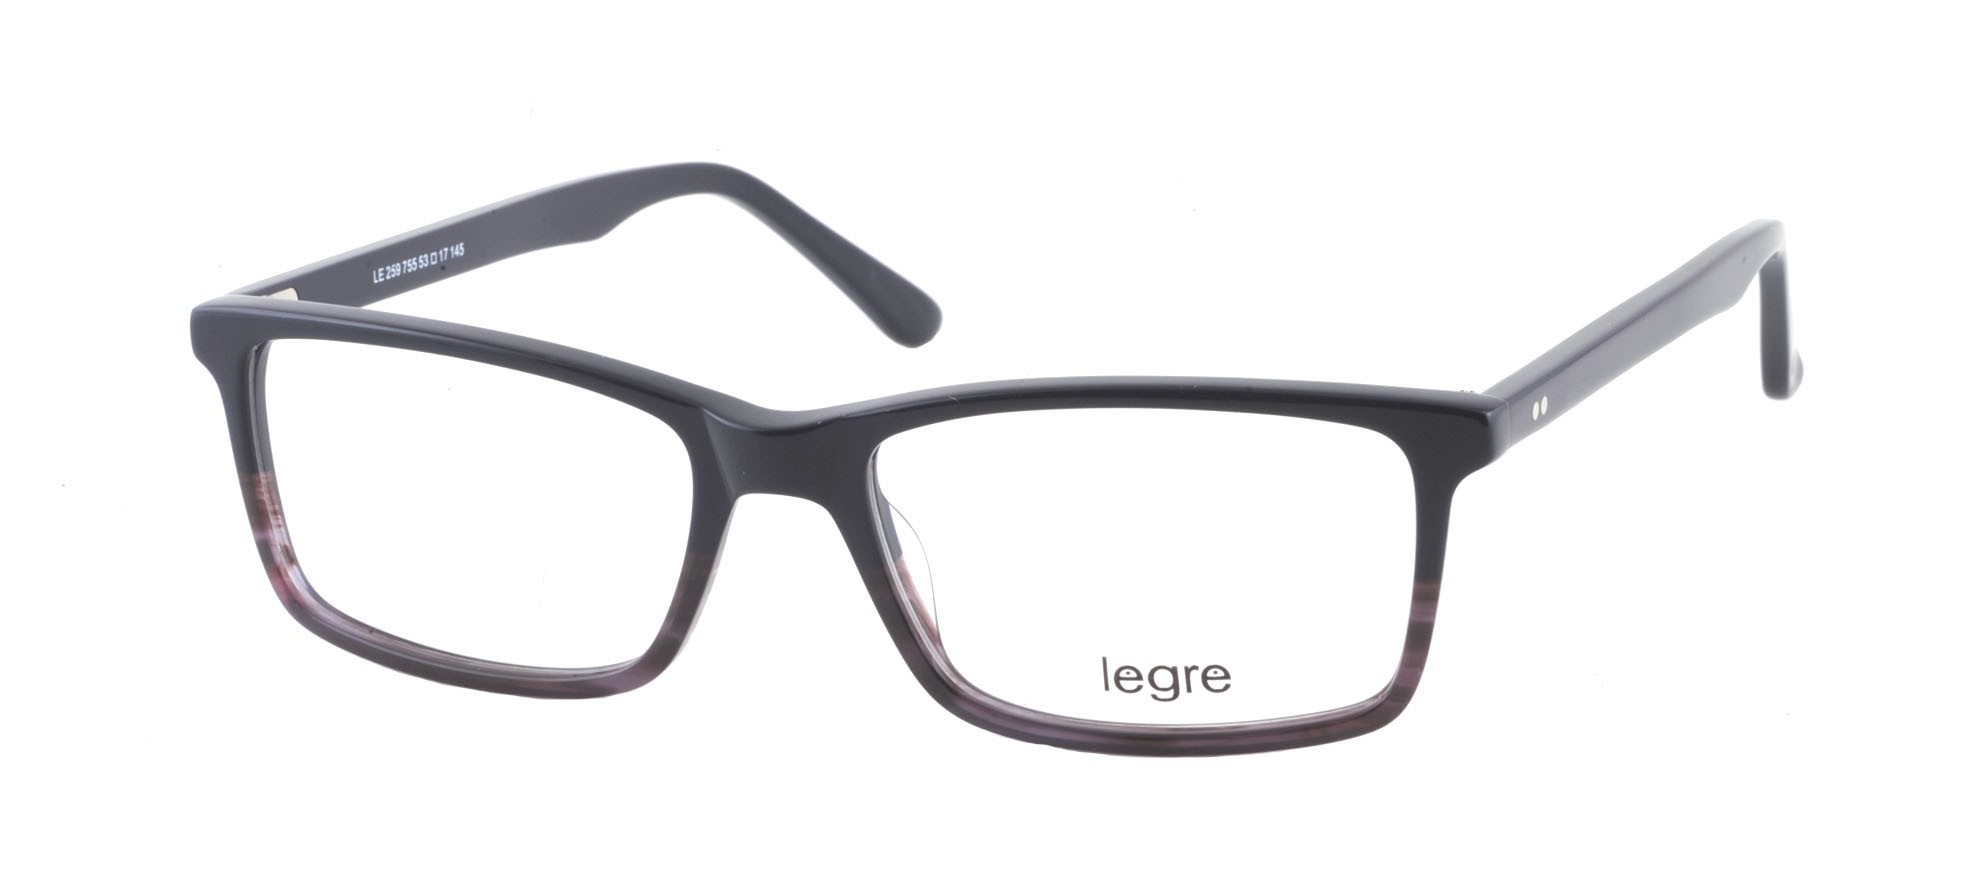 Legre 259 Eyeglasses